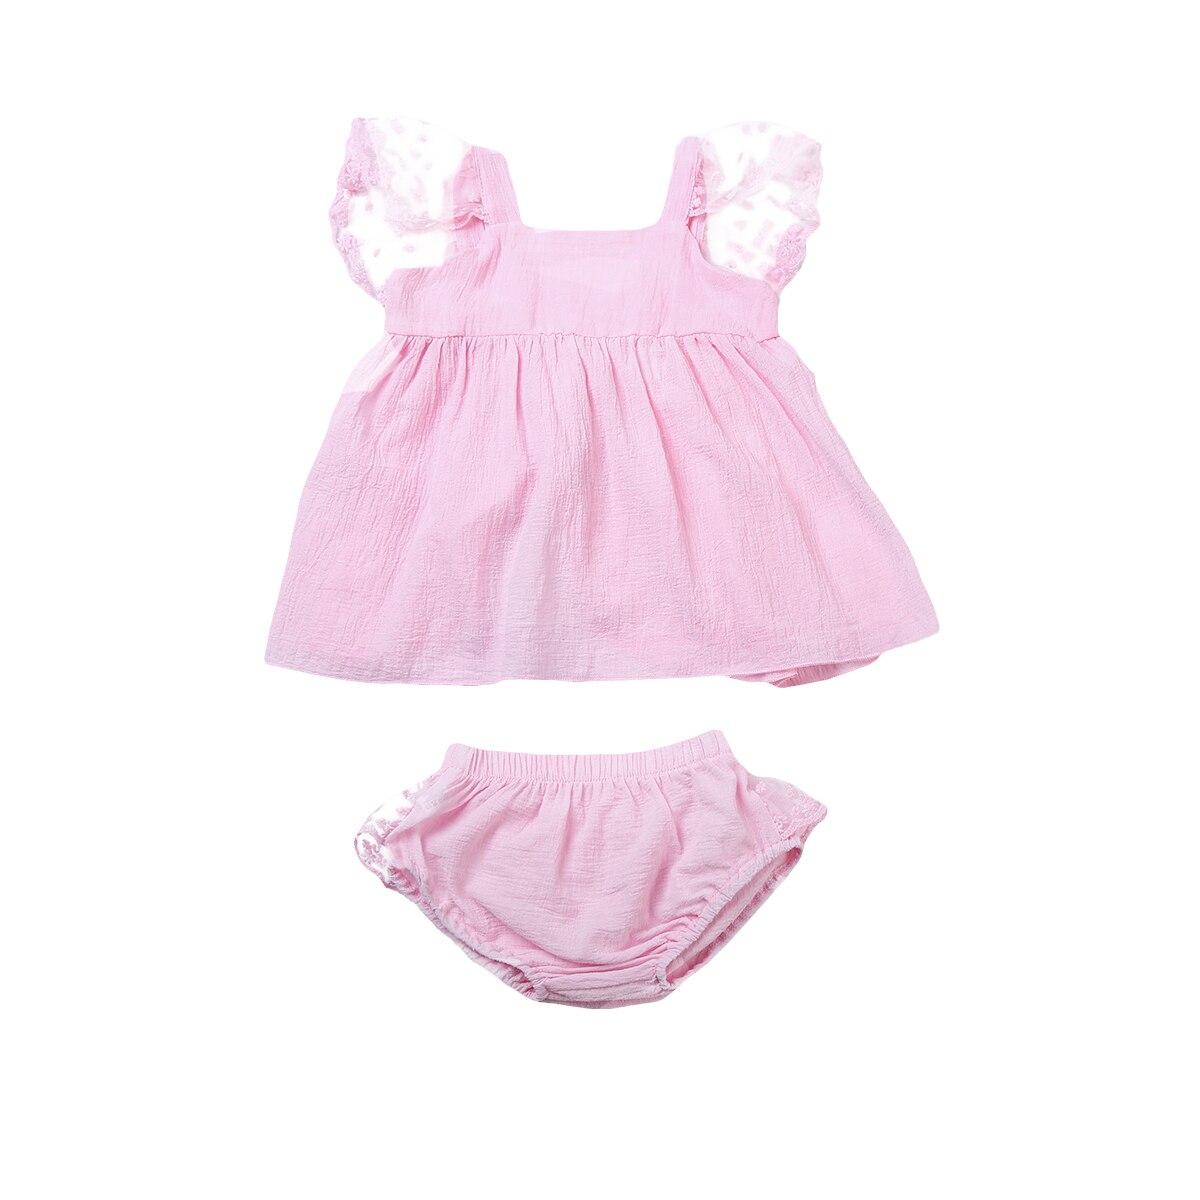 Summer Infant Baby Girl Clothes Ruffle Sleeveless Backless Mini Dress Tops Shorts Bottom Newborn Baby Girl Clothes Baby Clothing